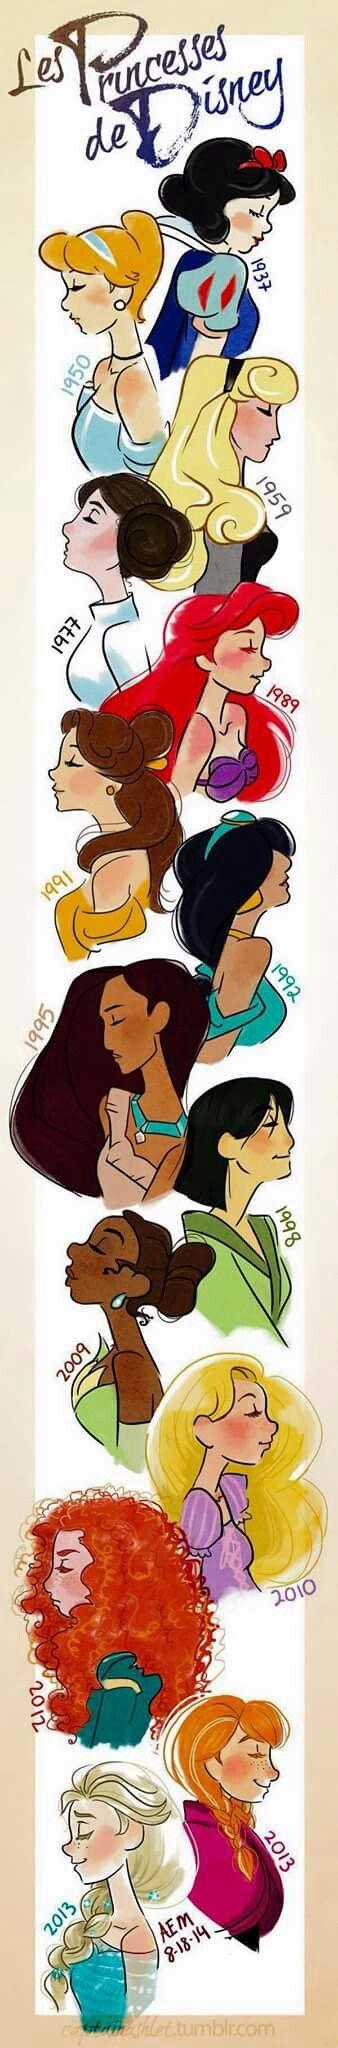 "Principesse Disney più ""l'intrusa"" principessa Leila.."